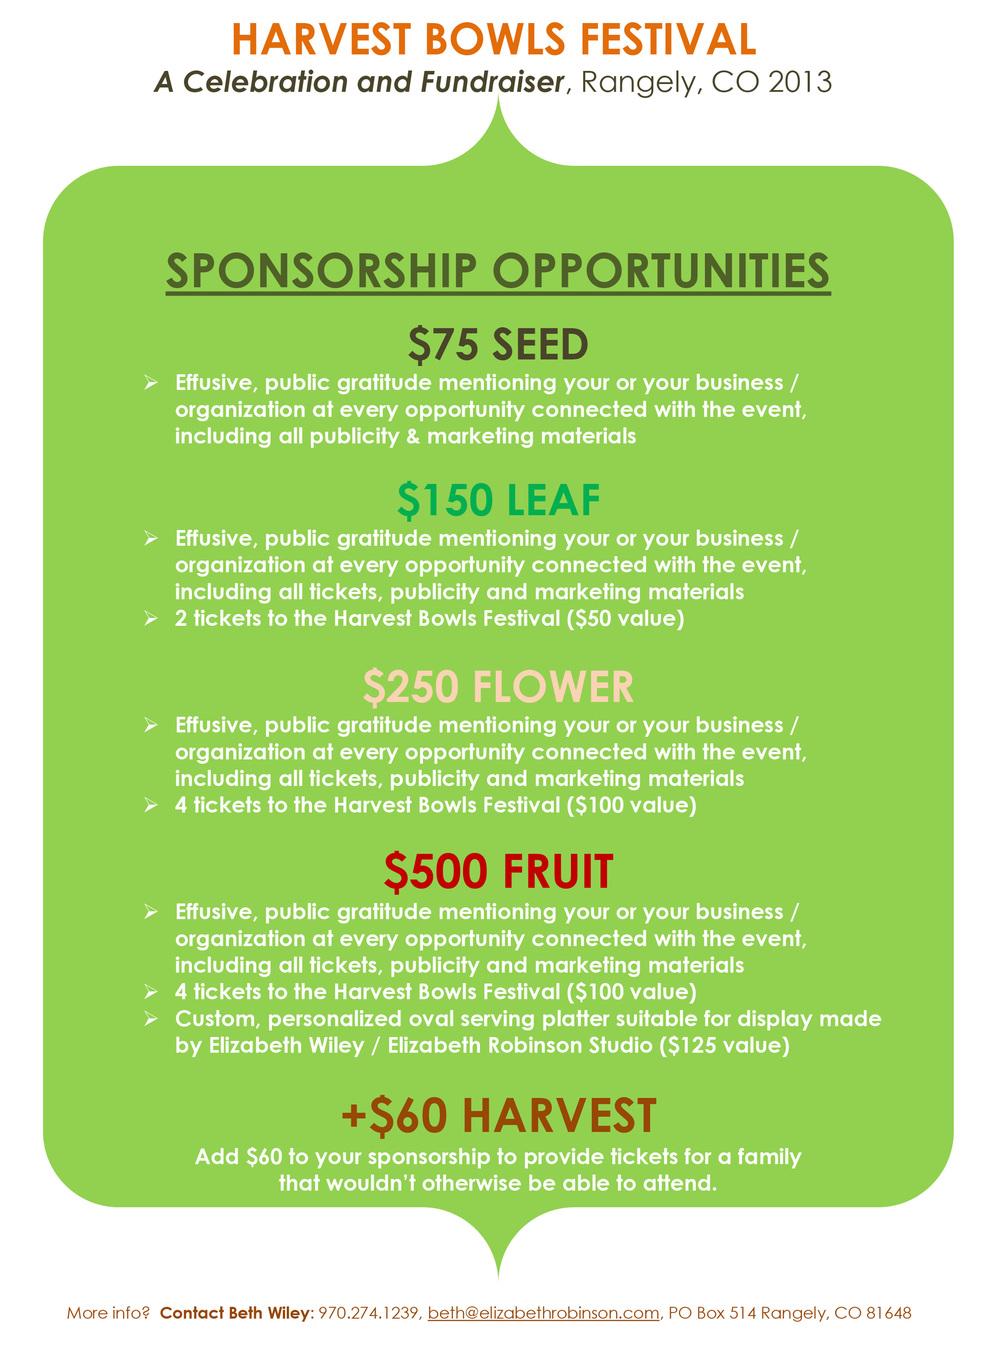 Harvest-Bowls-Sponsorship-web.jpg